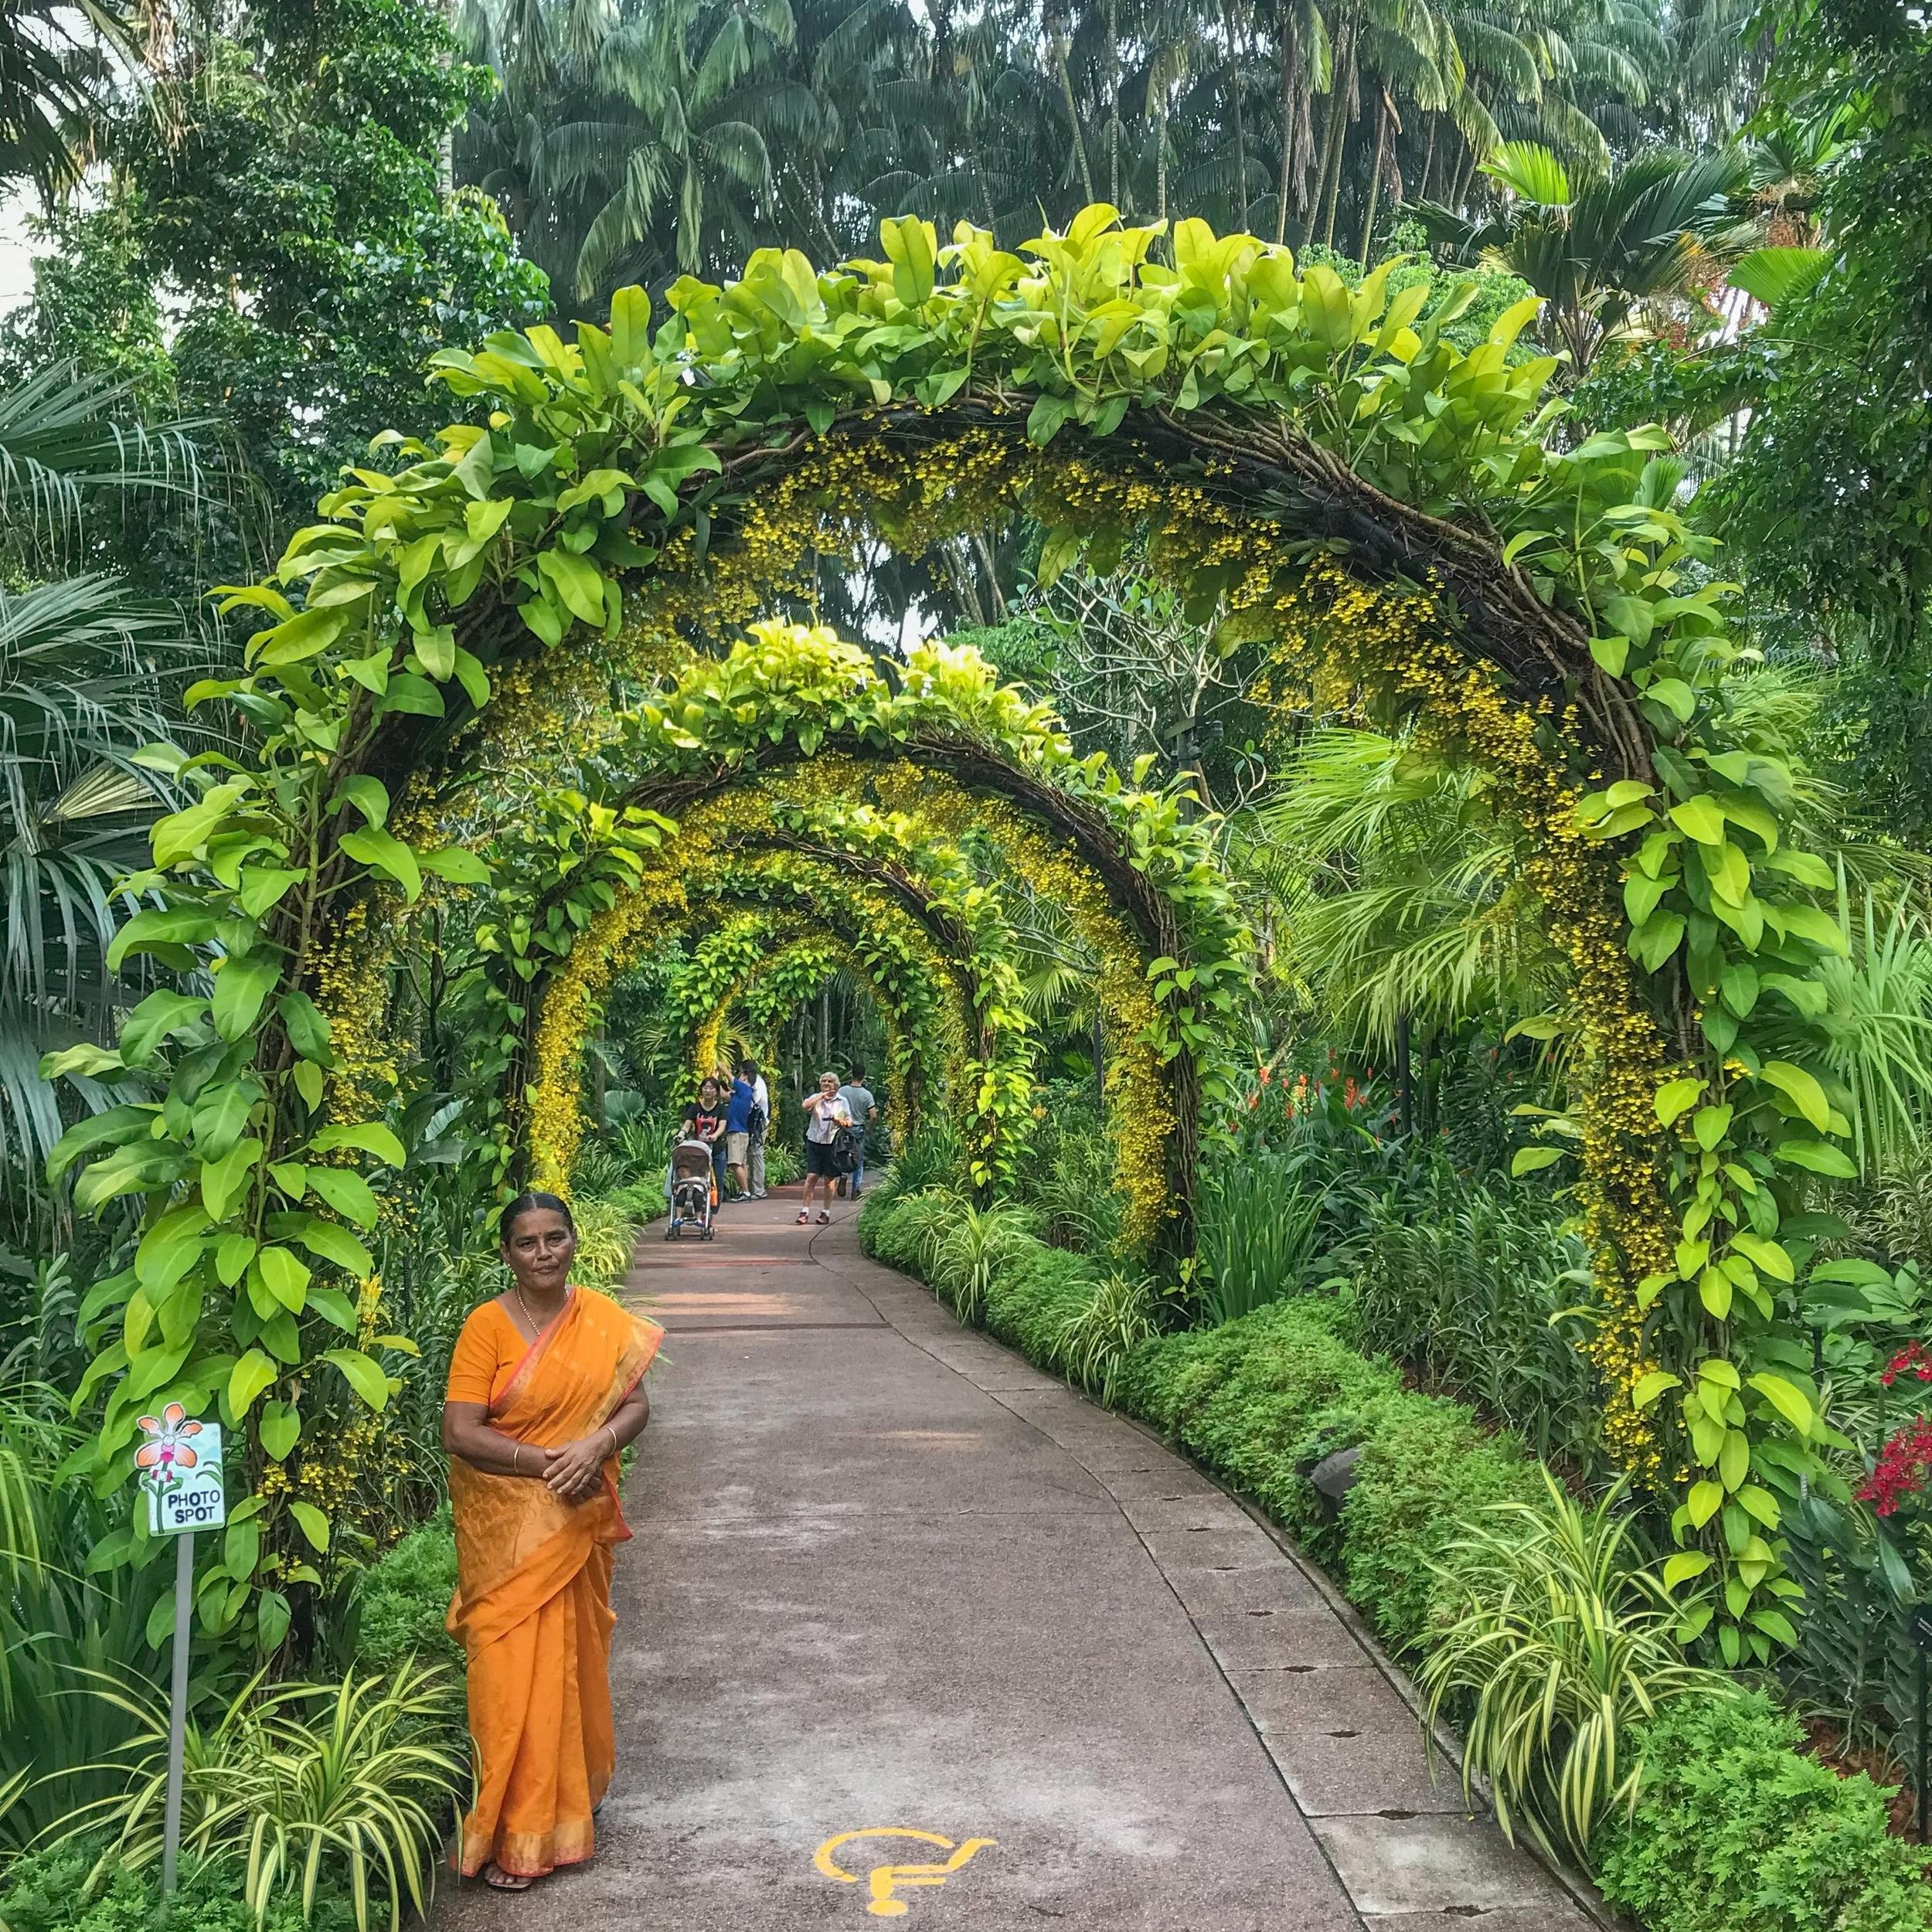 The actual botanic garden in Singapore